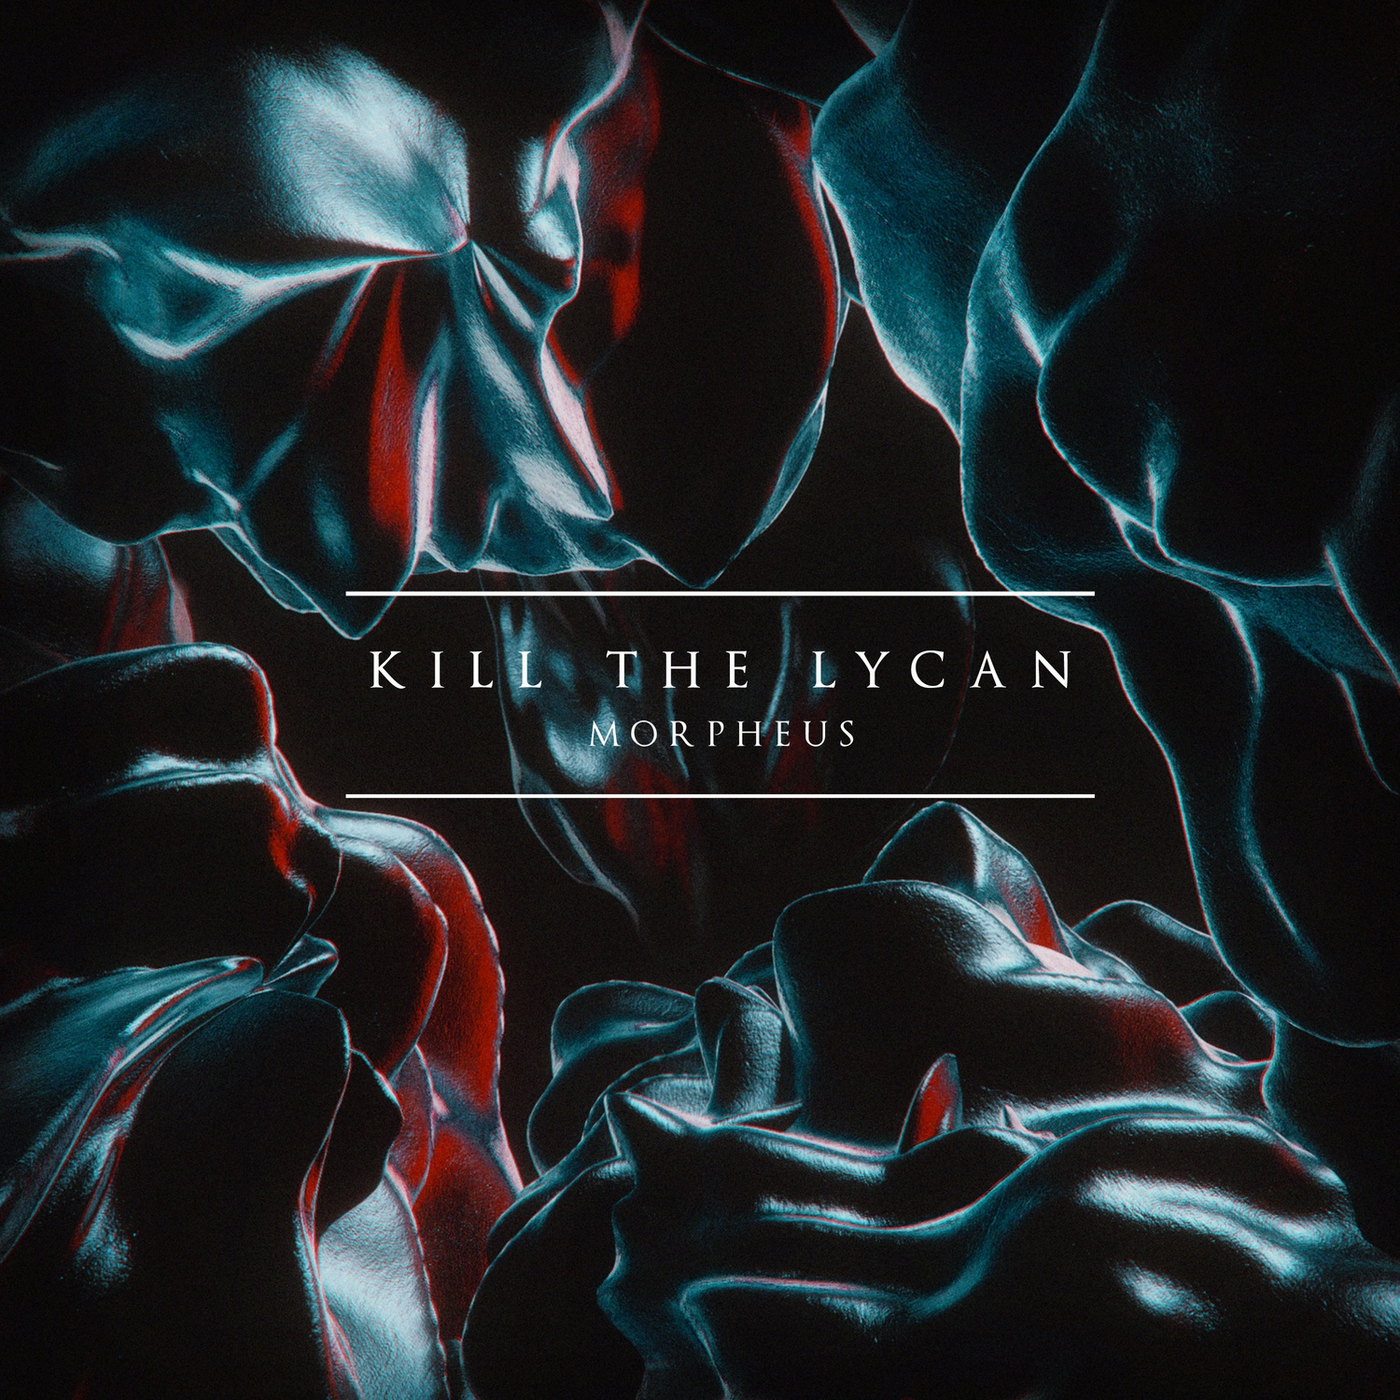 Kill the Lycan - Morpheus [single] (2018)